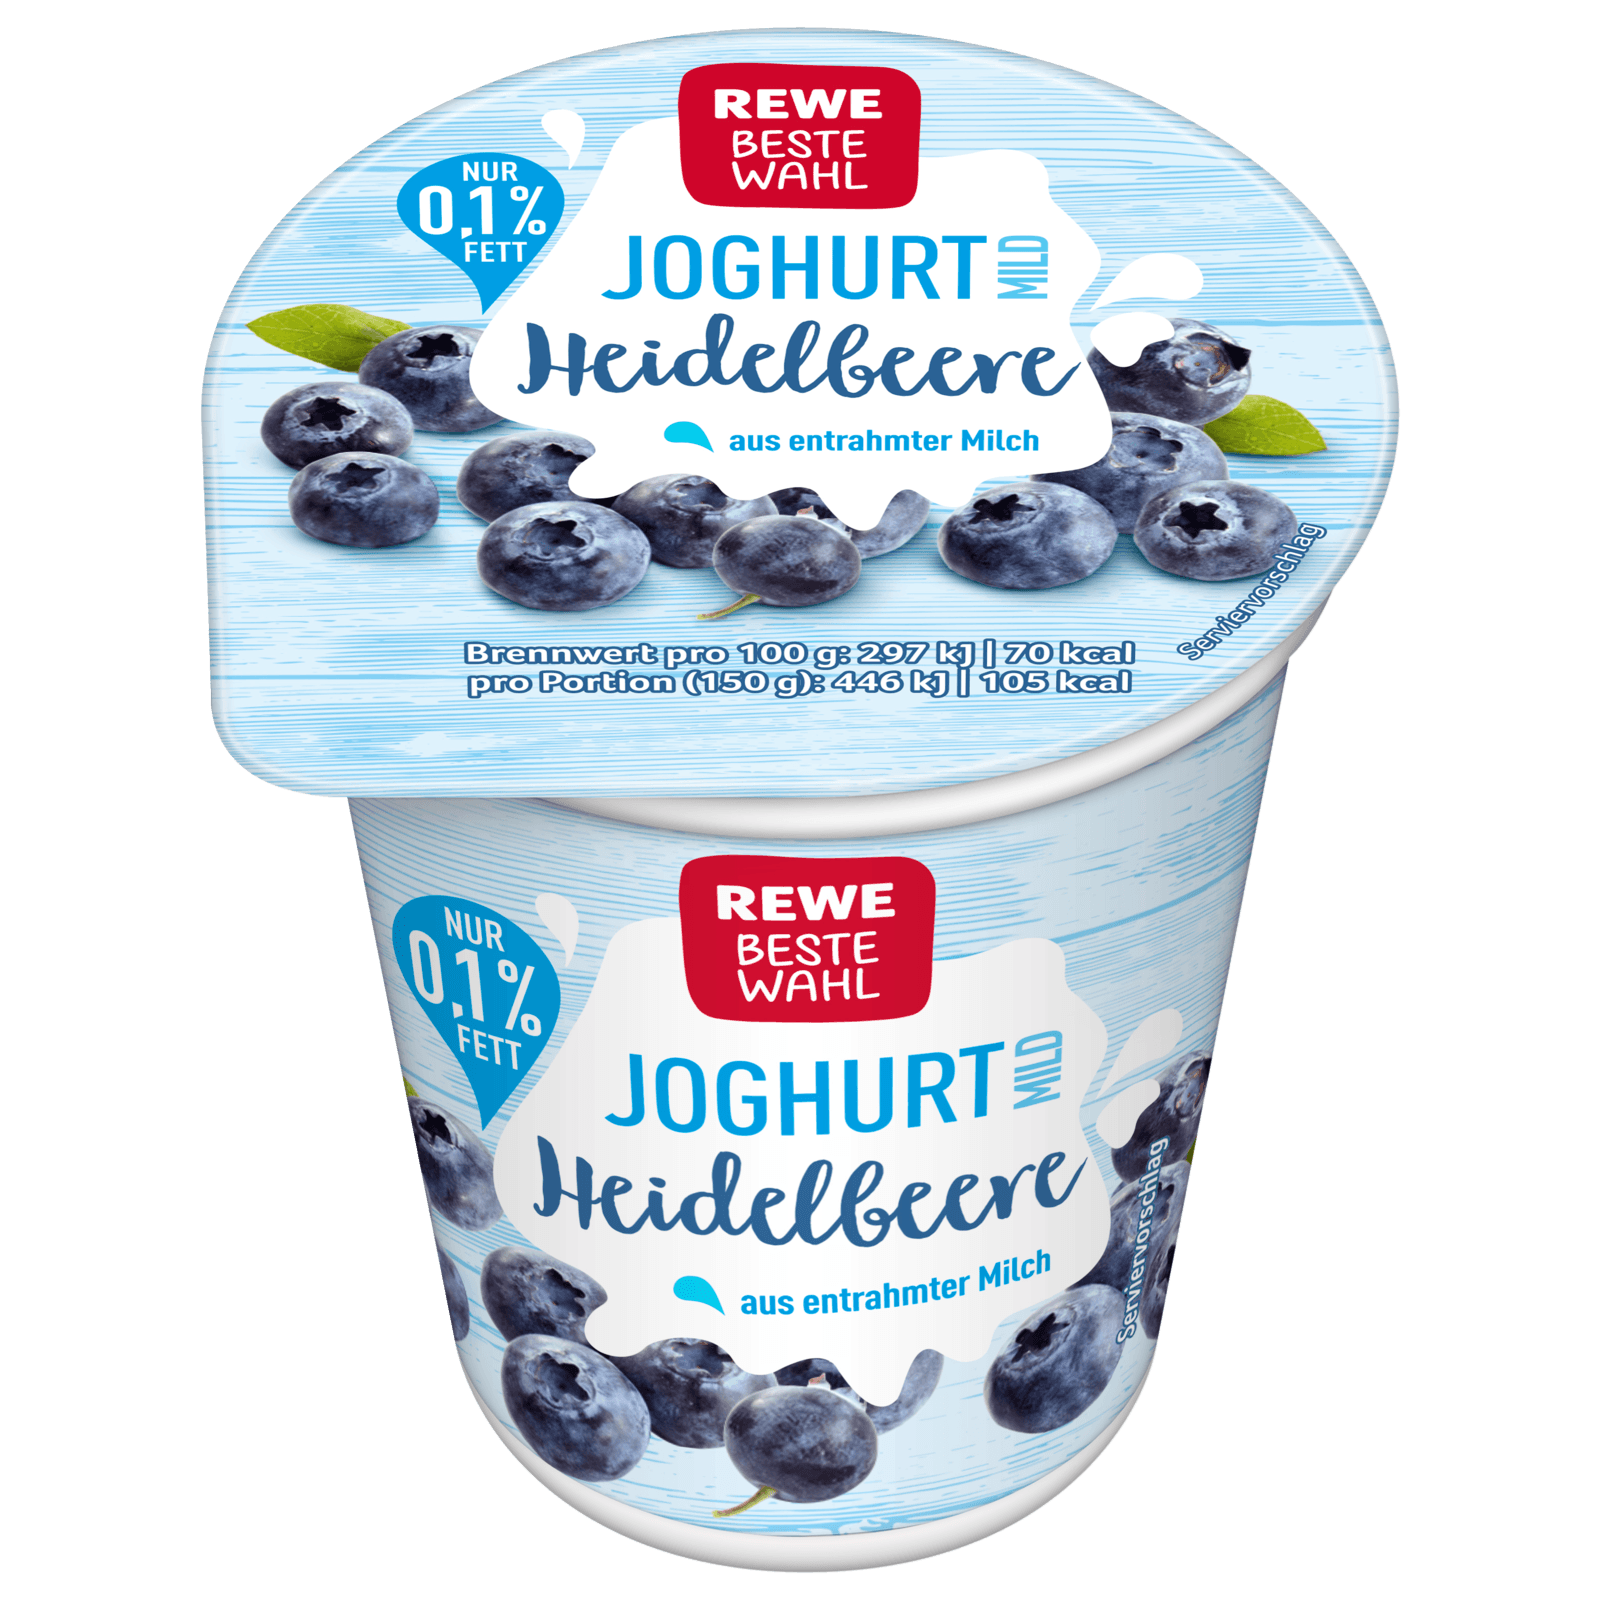 REWE Beste Wahl Fruchtjoghurt mild Heidelbeere 150g